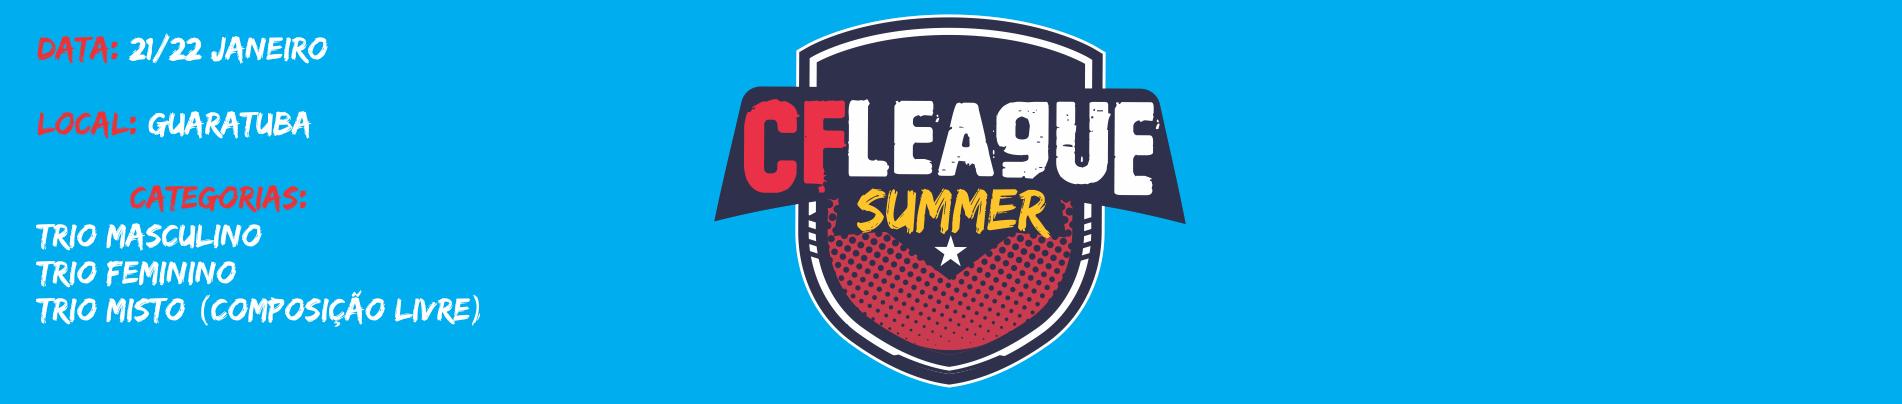 CF LEAGUE SUMMER - 2017 - Imagem de topo